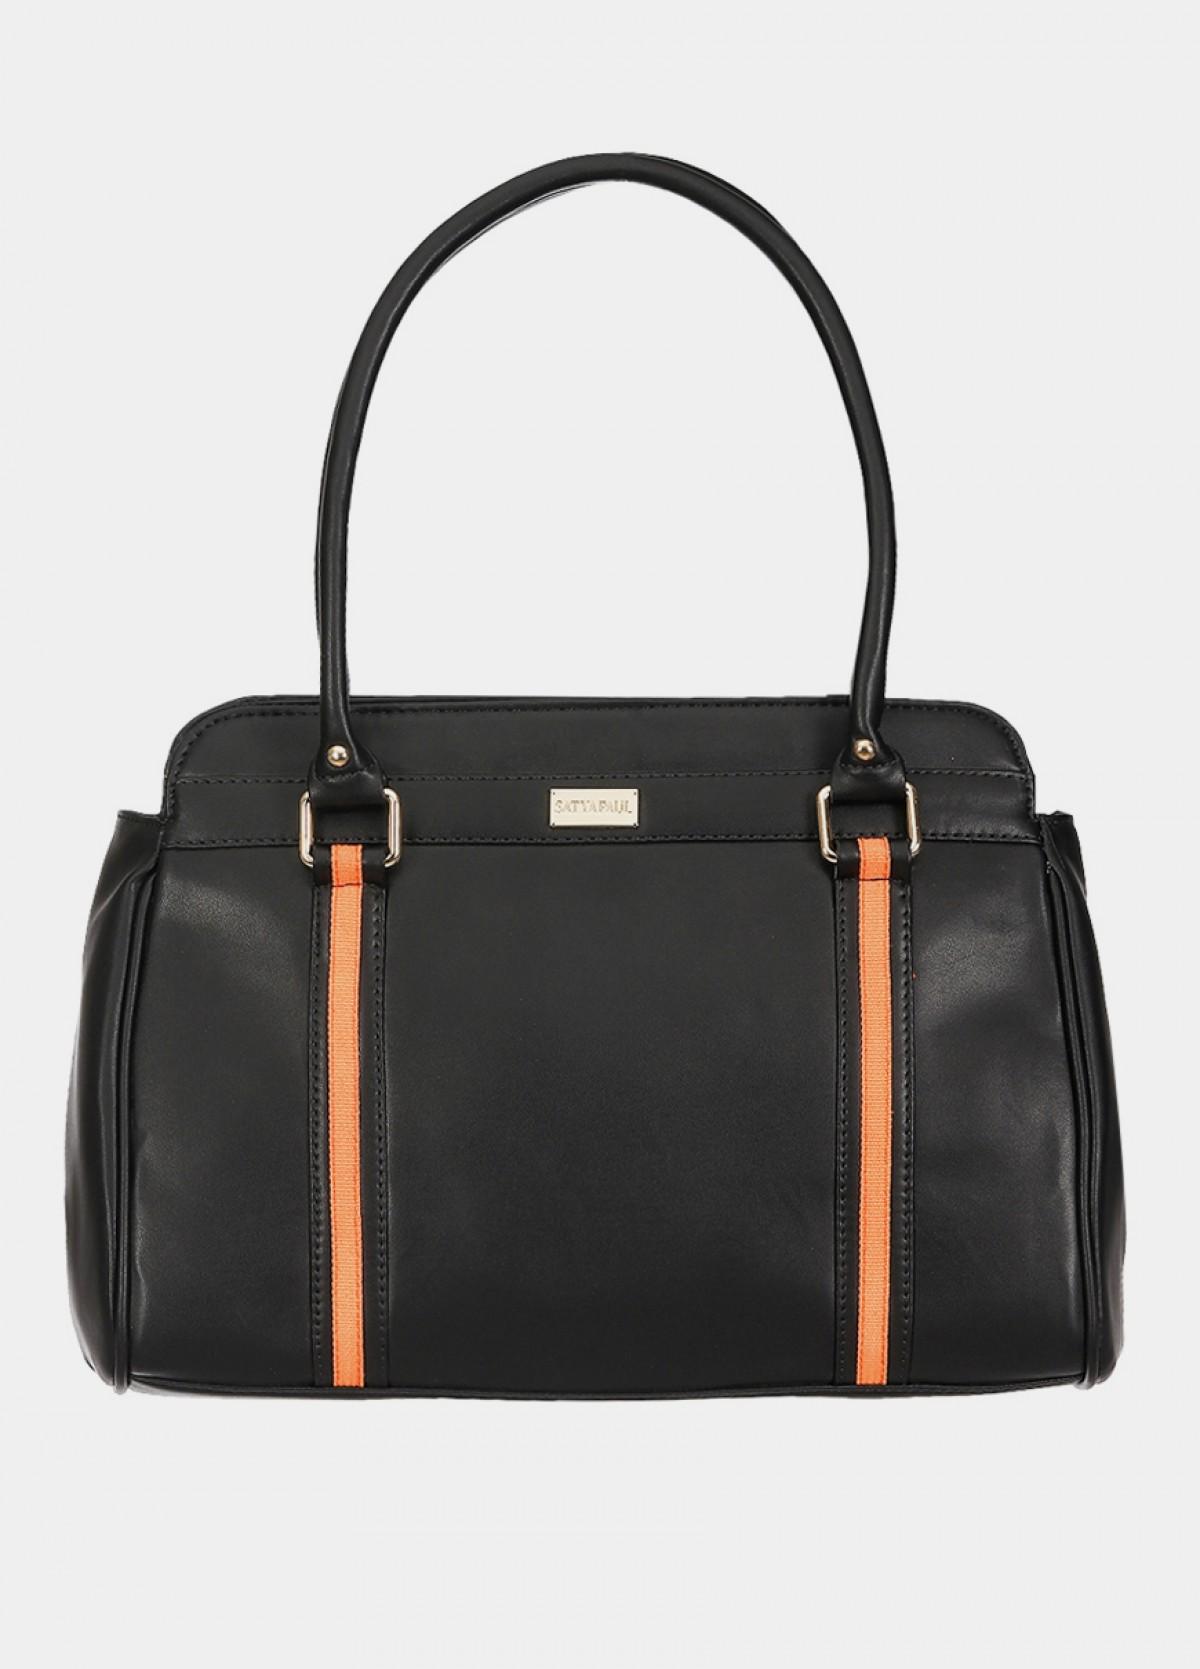 The Satyapaul Formal Black Hand Bag